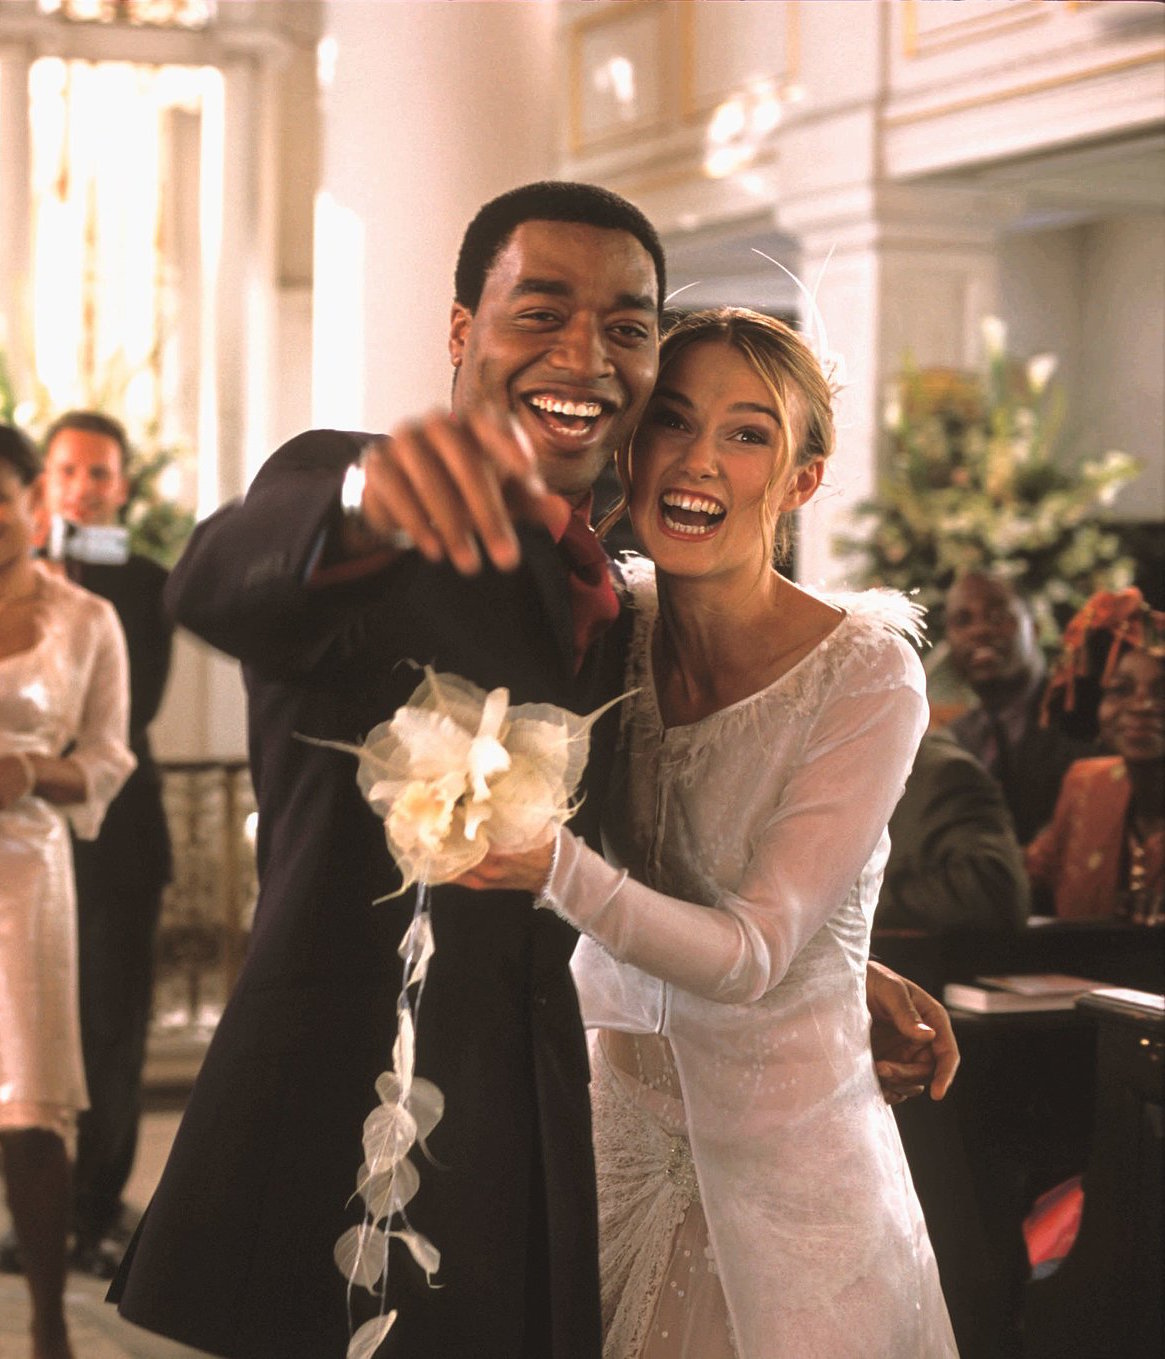 Movie-Wedding-Dress-13.jpg